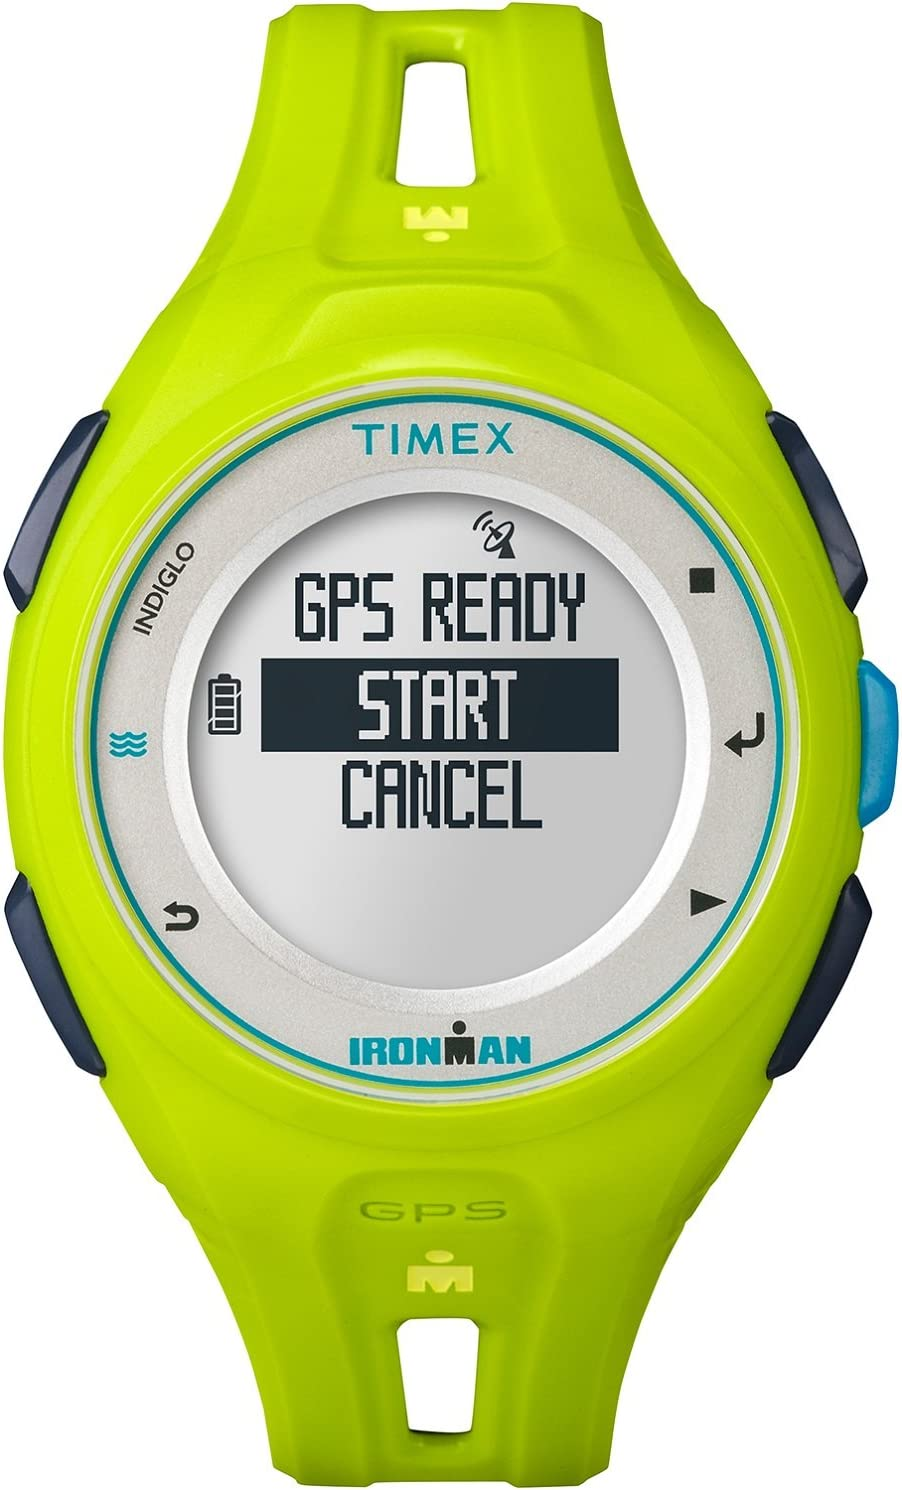 Timex Ironman Run X20 Reloj GPS de tamaño completo